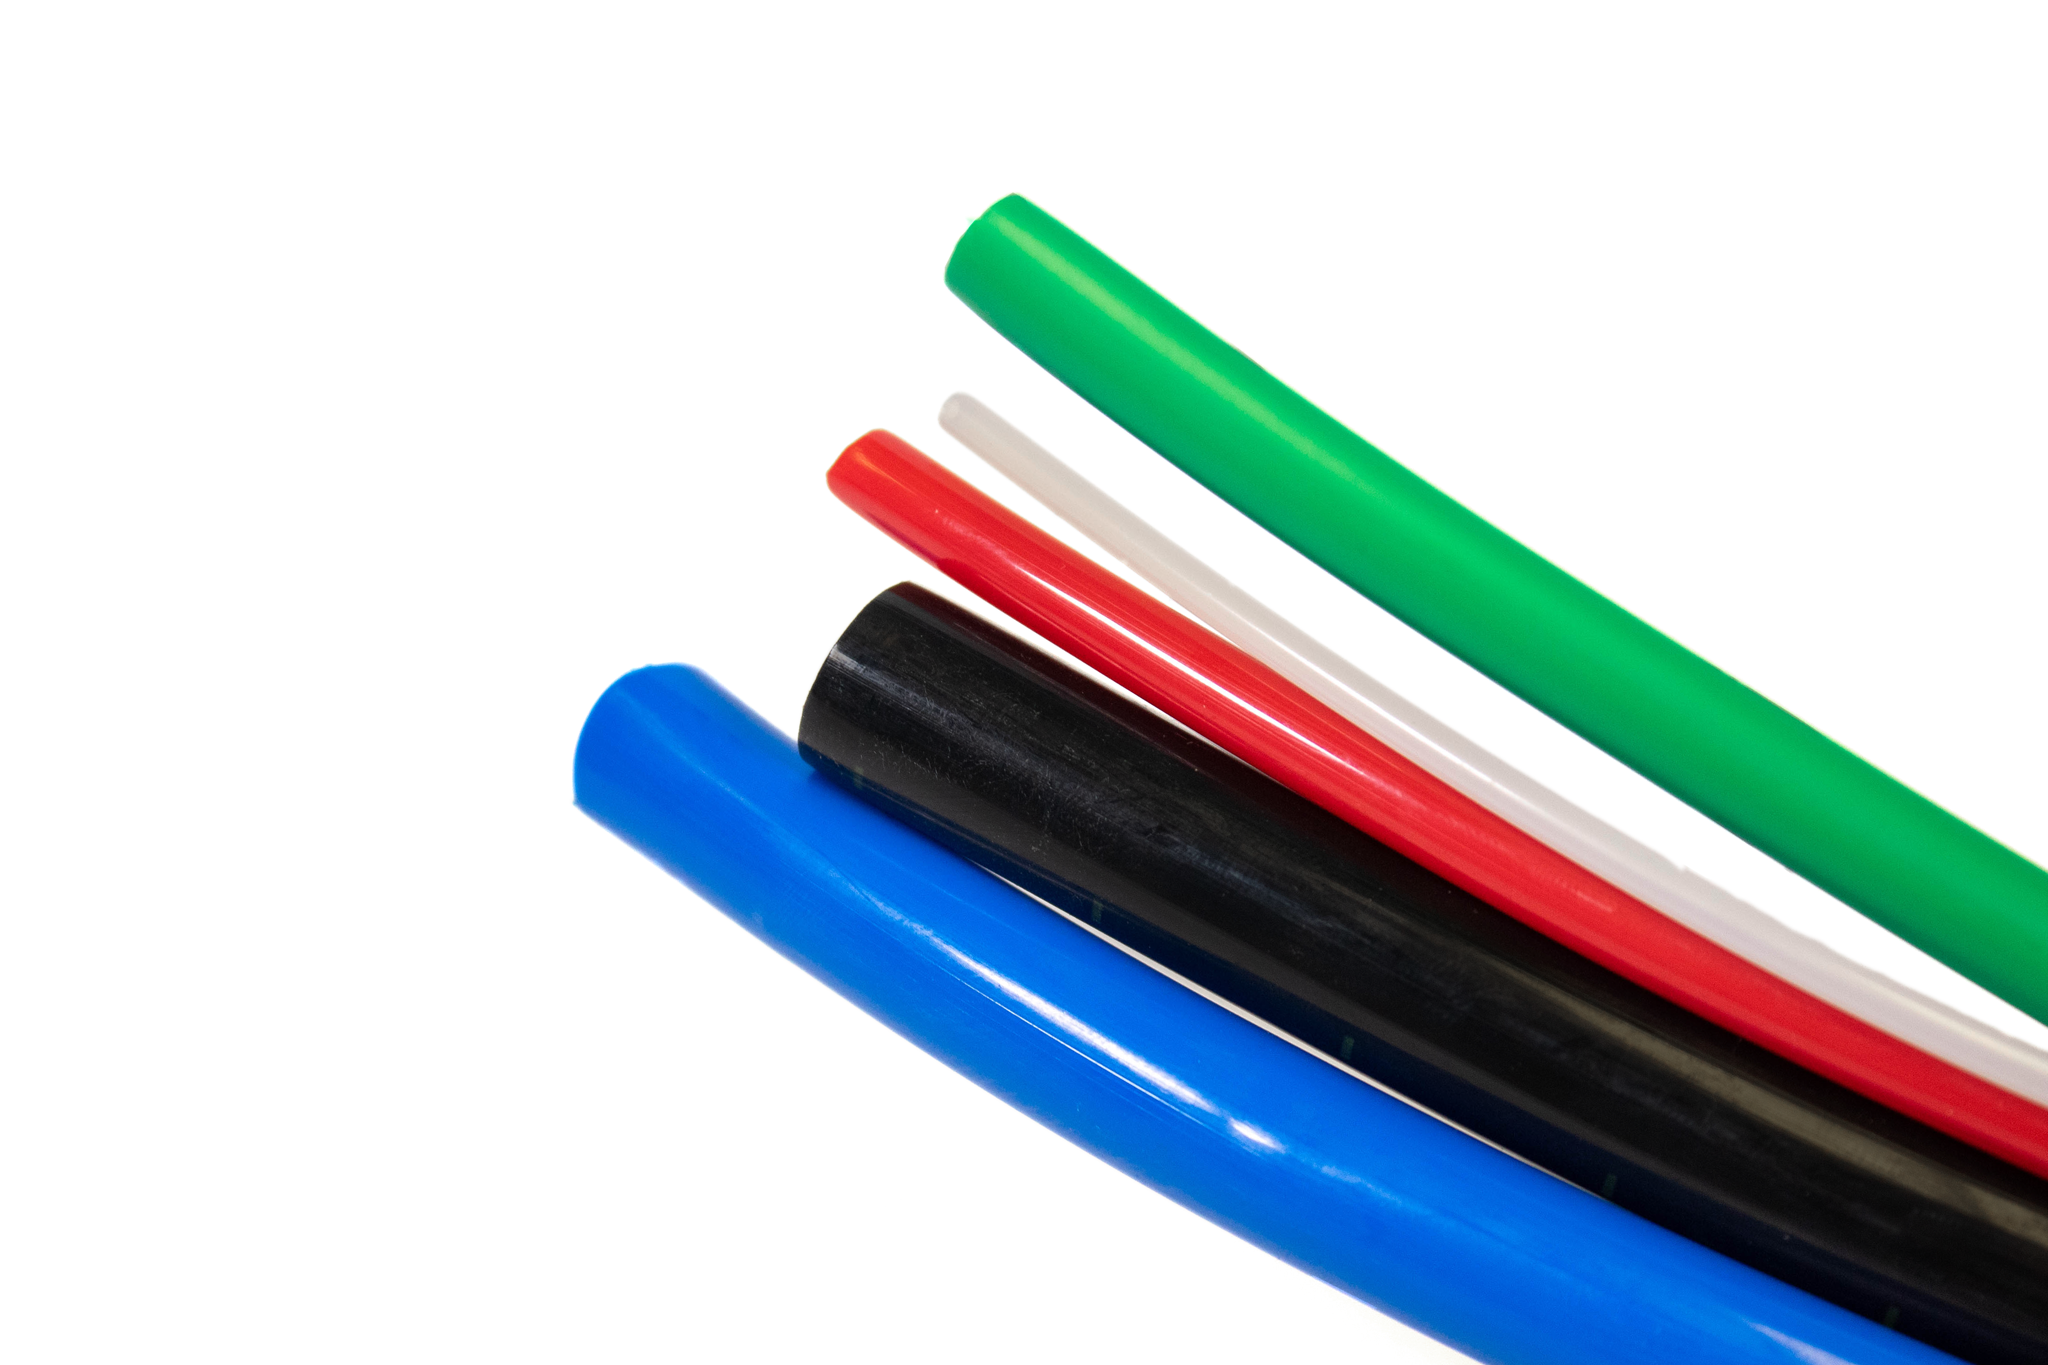 8.0mm O/D x 6.0mm I/D x 1.0mm Wall Natural - Flexible Nylon Hose Tubing | Great UK Pricing